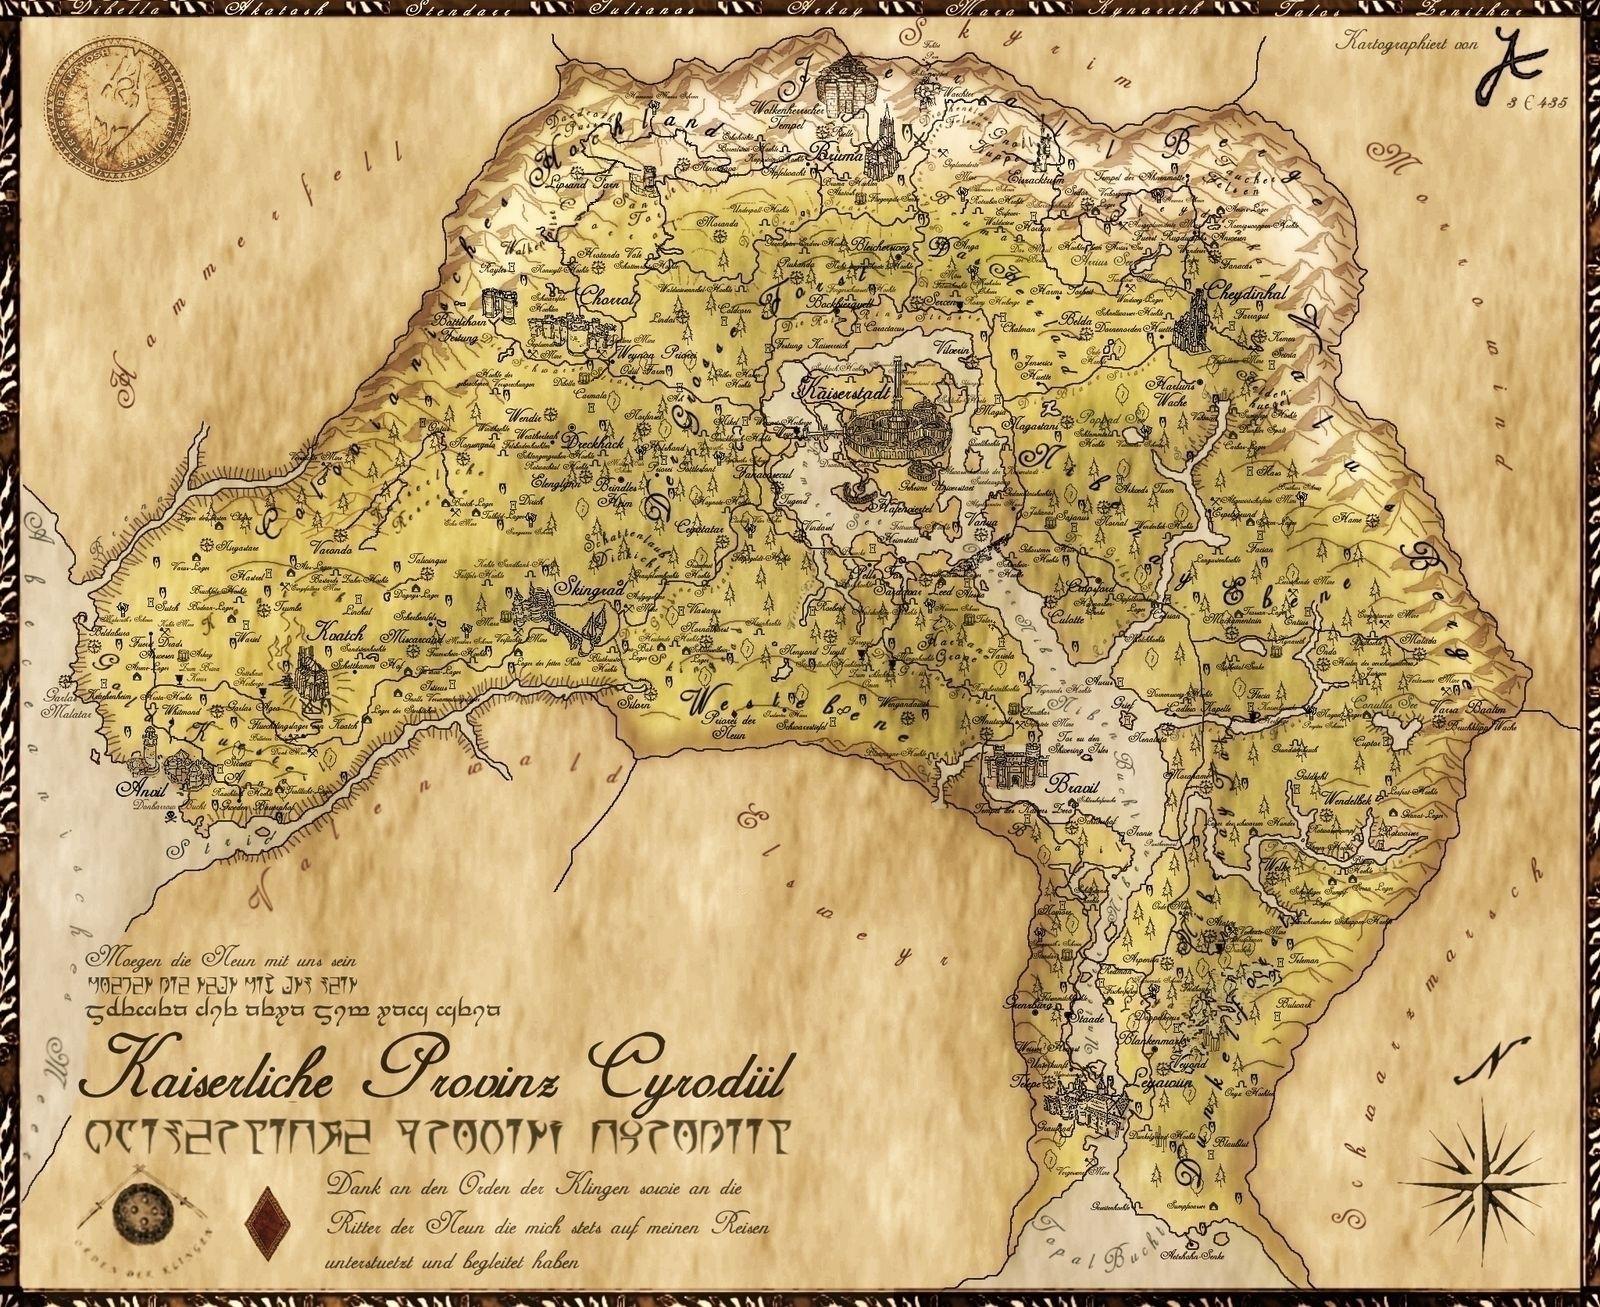 The Elder Scrolls IV: Oblivion clipart #3, Download drawings